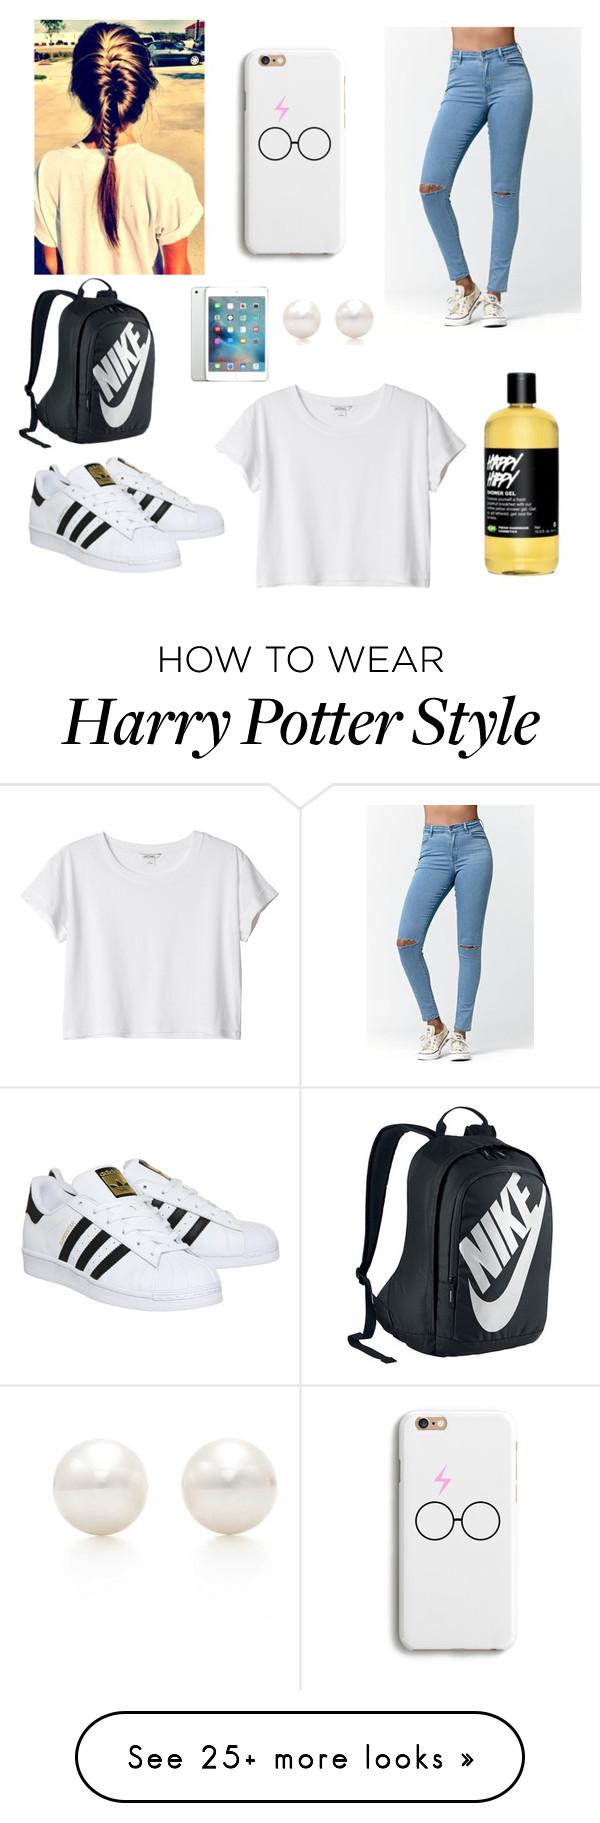 """School Outfit"" by janelingodfrey on Polyvore featuring moda, Bullhead Denim Co., adidas, Monki, NIKE, Apple ve Tiffany & Co."